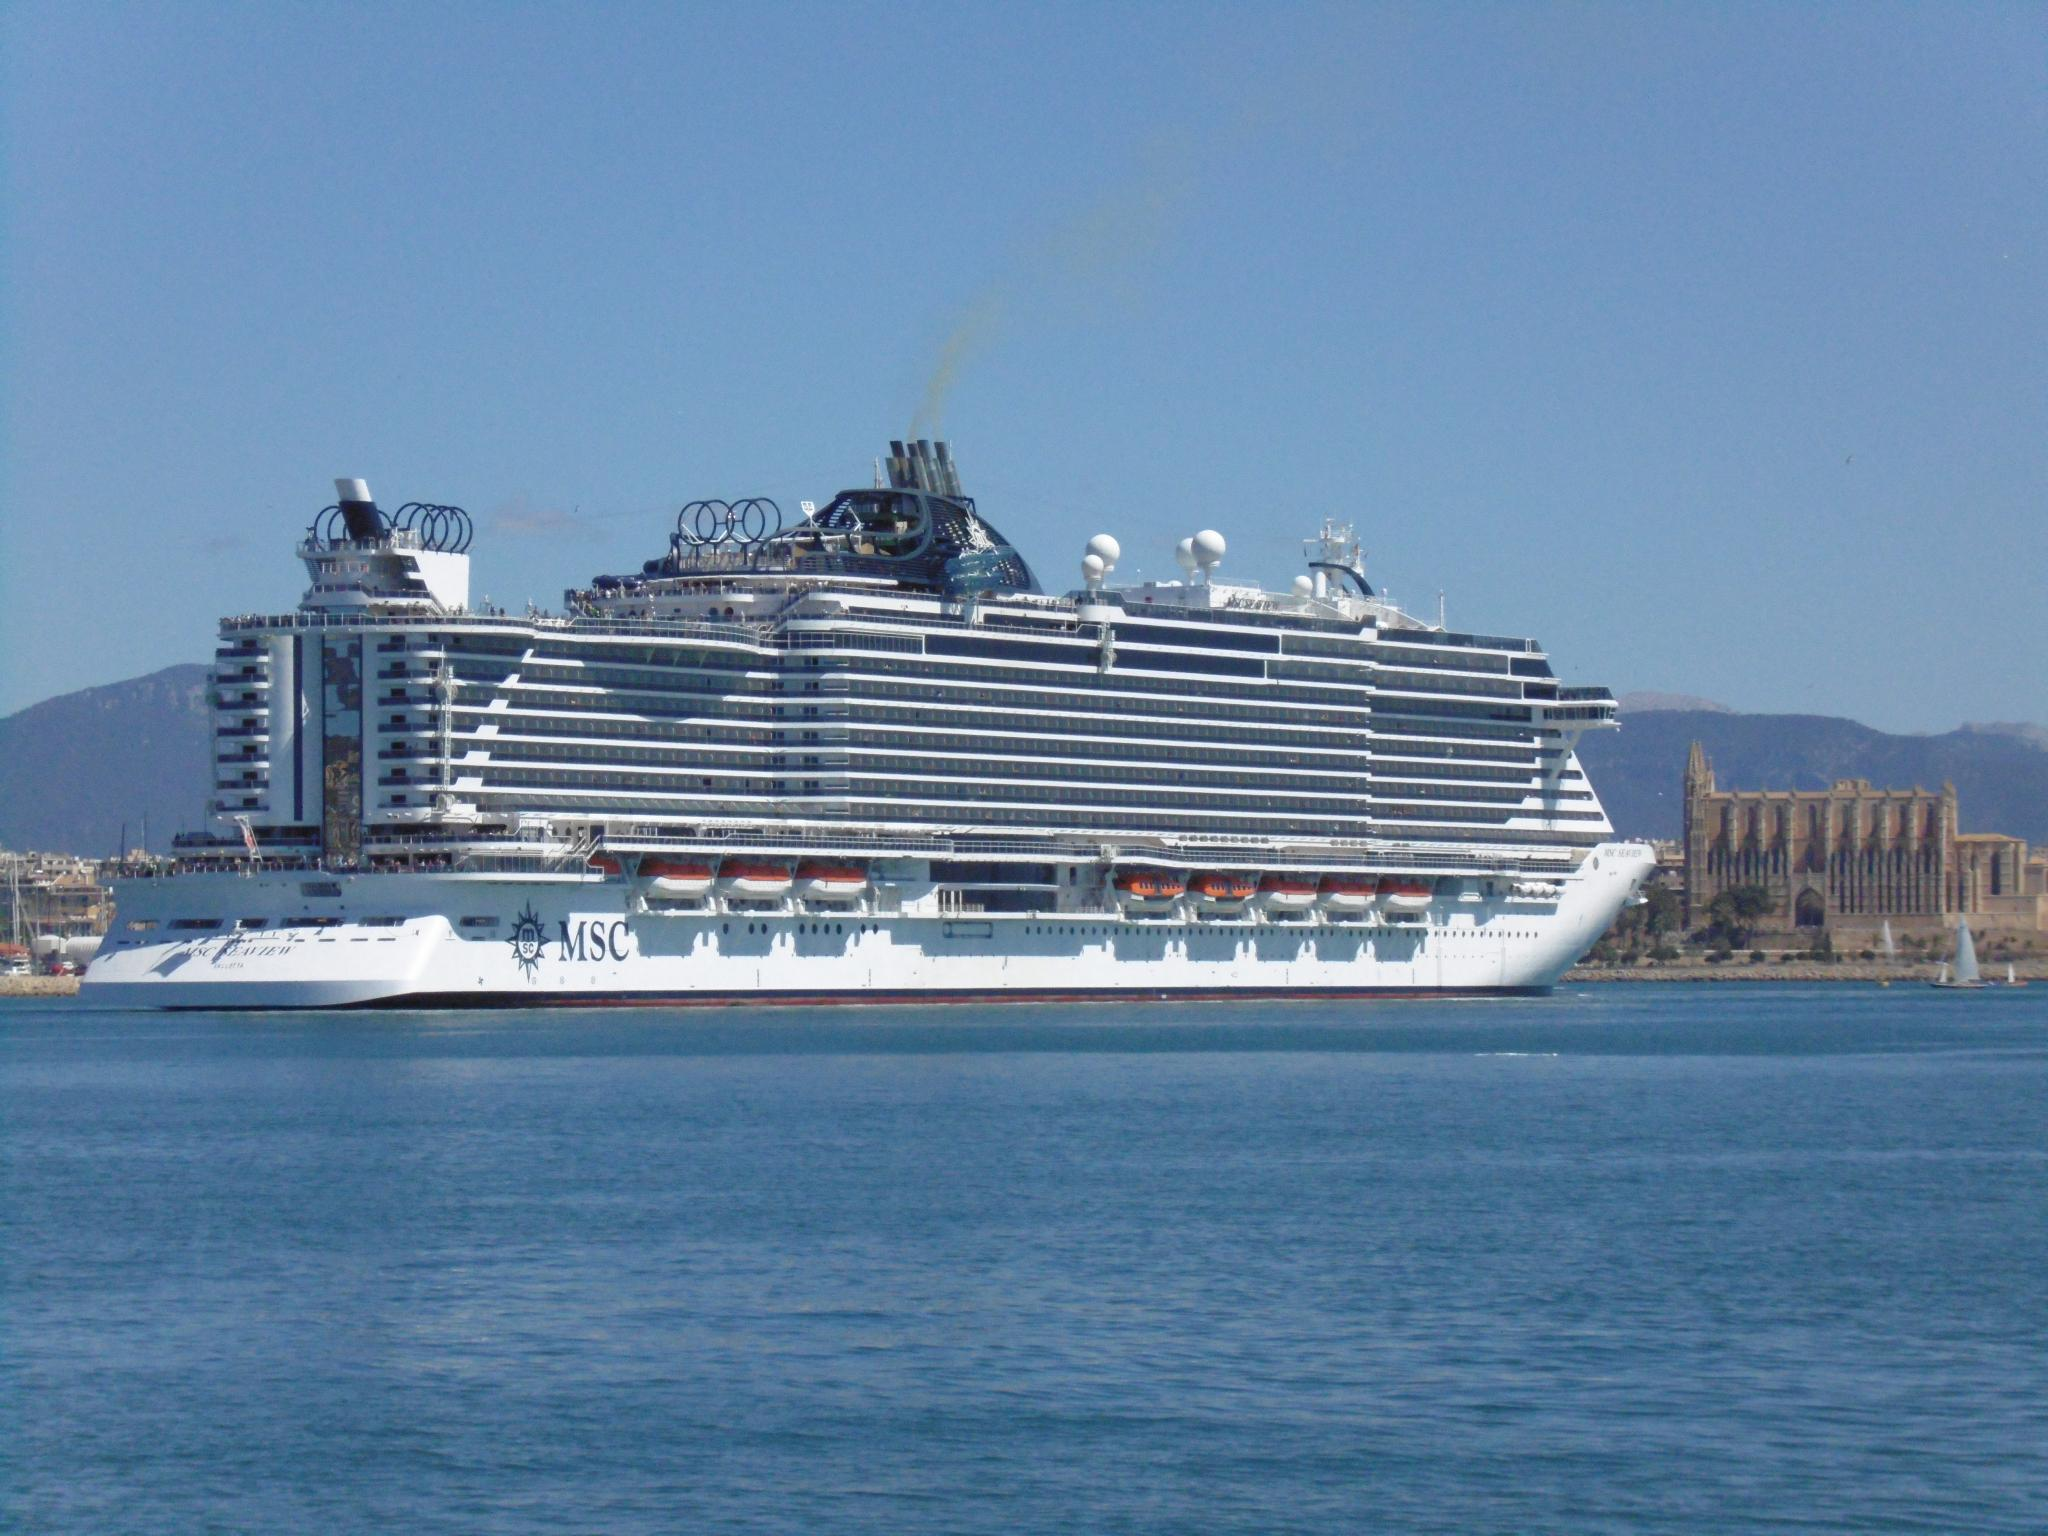 PALMA. CRUCEROS. El crucero 'MSC Seaview' se presenta en Palma.